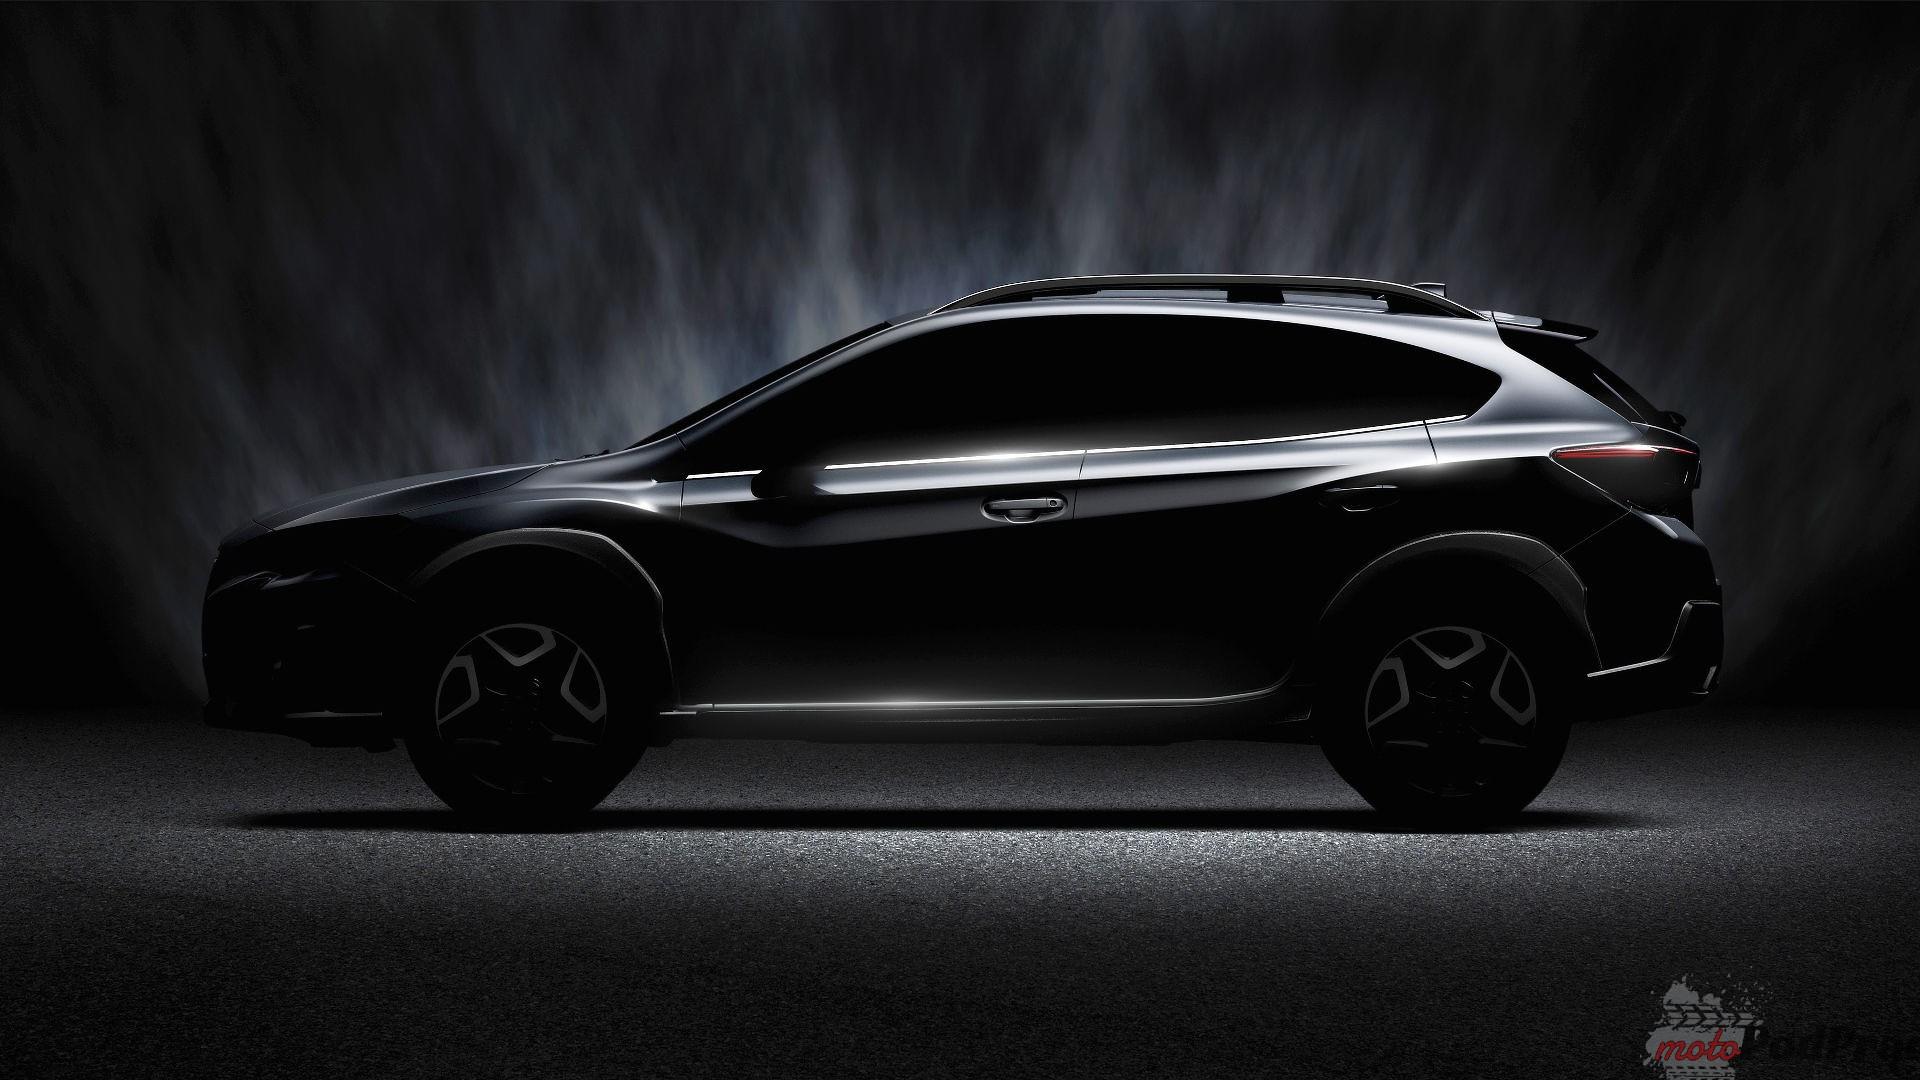 subaru crosstrek teaser Następca Subaru XV w drodze